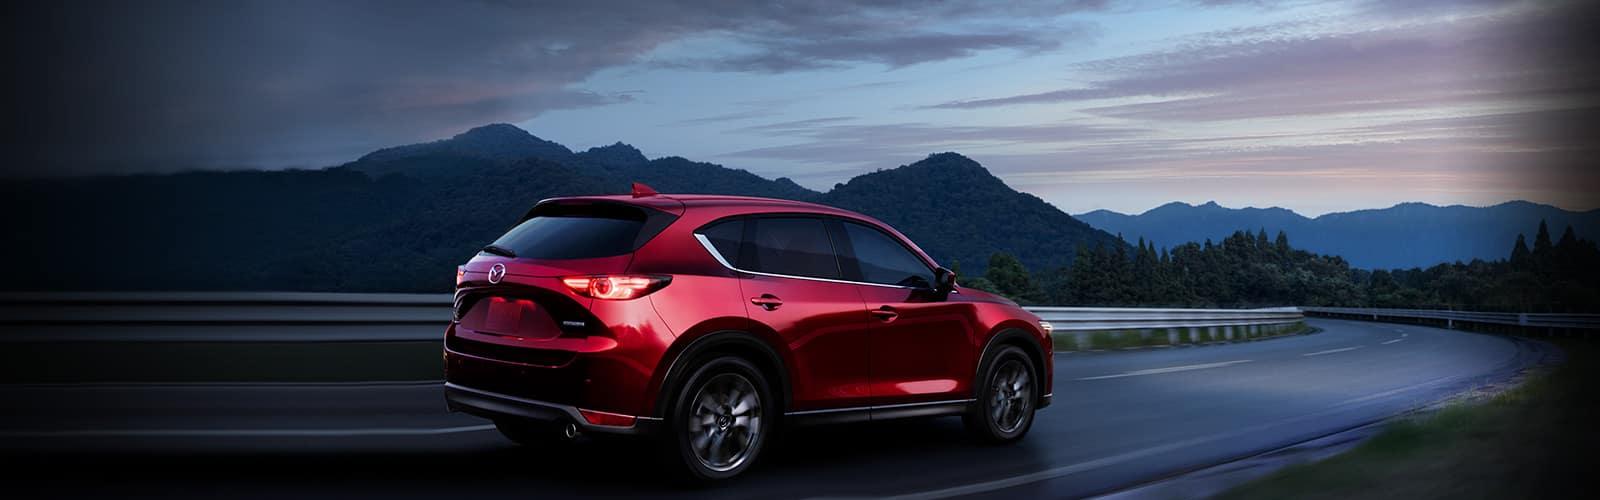 5_21_WV_Mazda_1600x500_inventory_search_bg